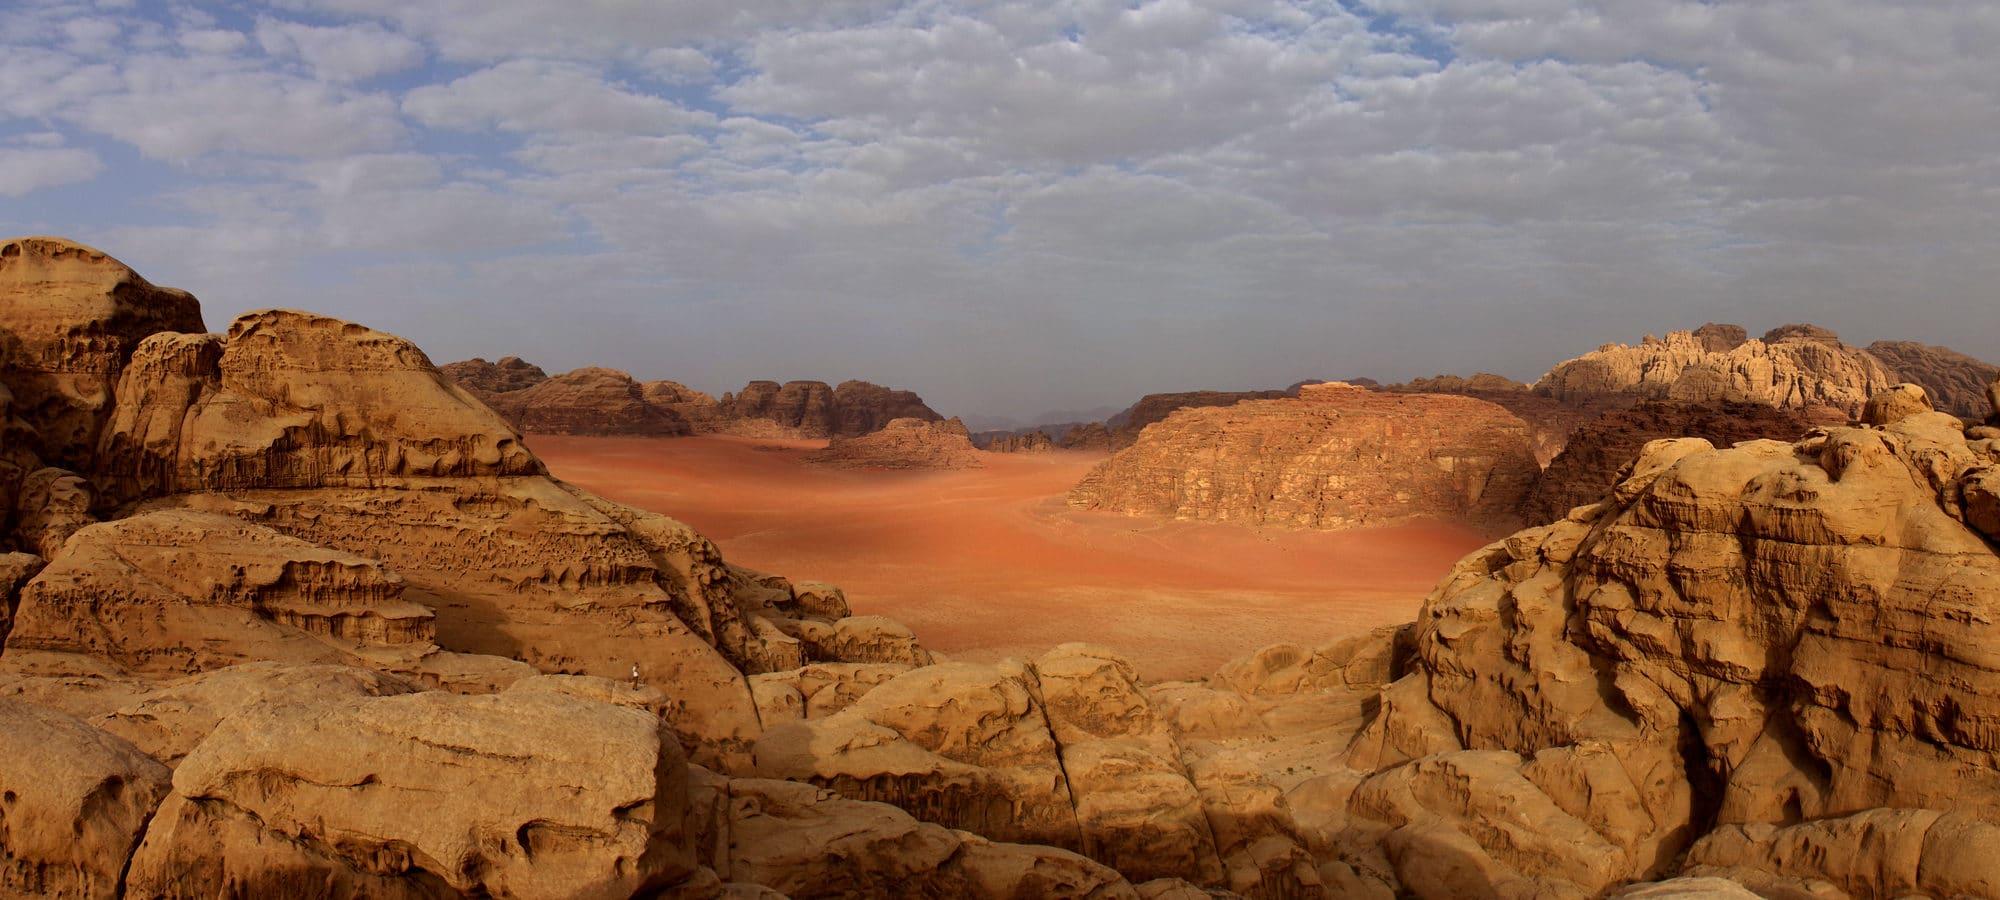 Jordanie, désert du Wadi Rum.